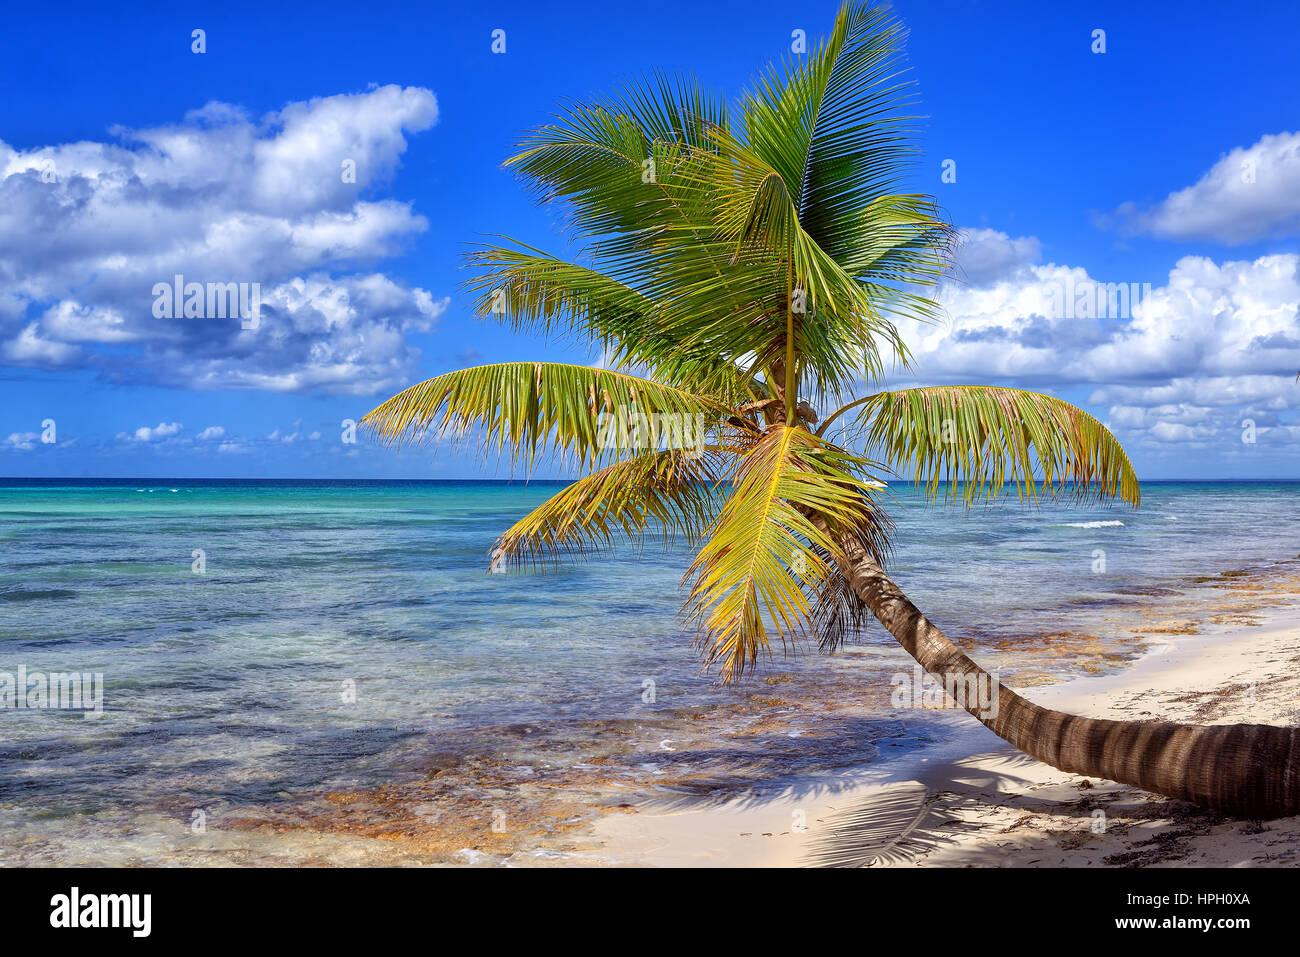 Tropical white sandy beach with palm trees. Saona Island, Dominican Republic Stock Photo